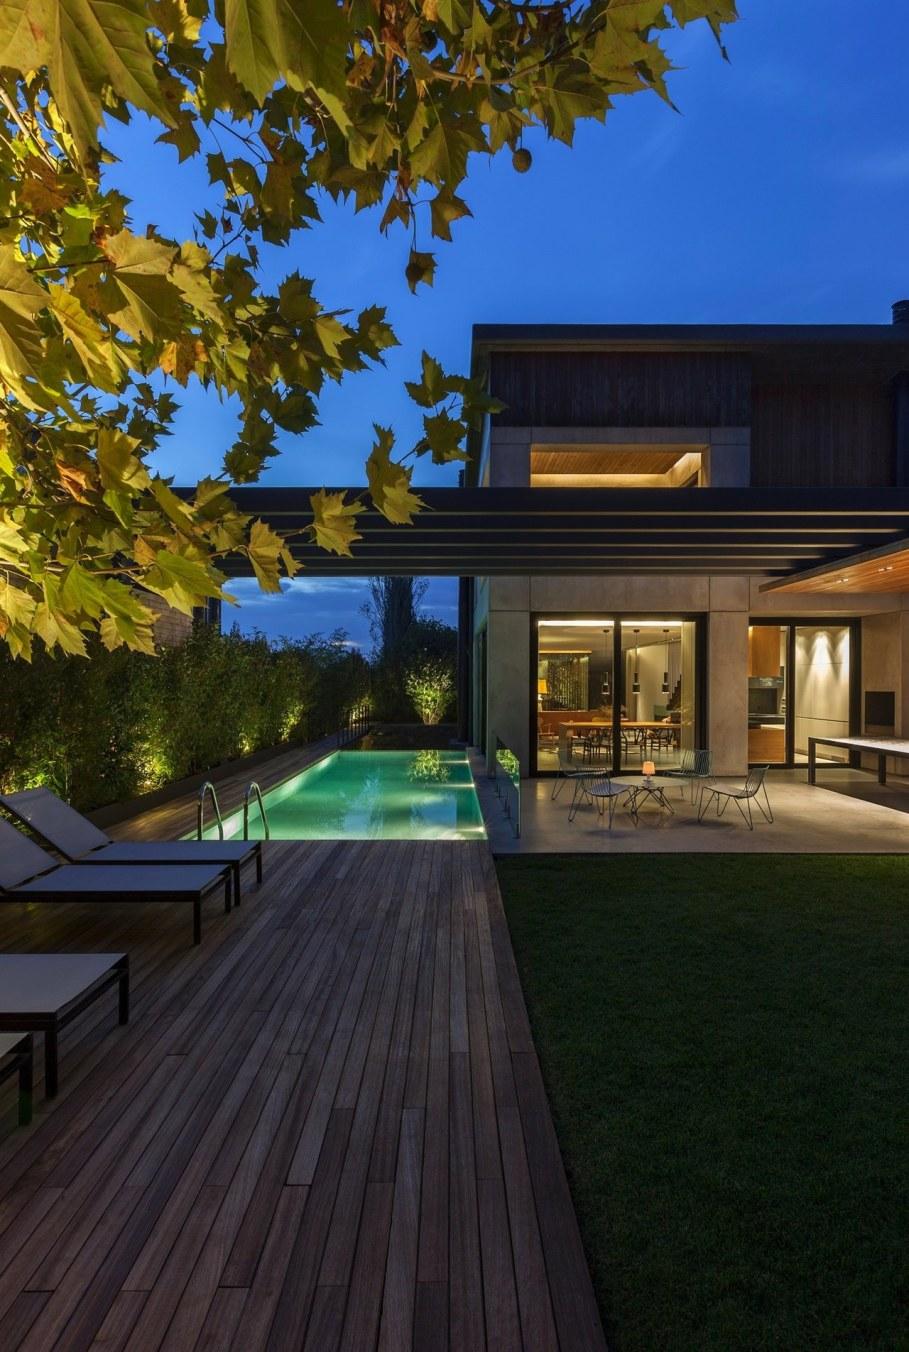 Woodwing villa in Greece - Swimming pool